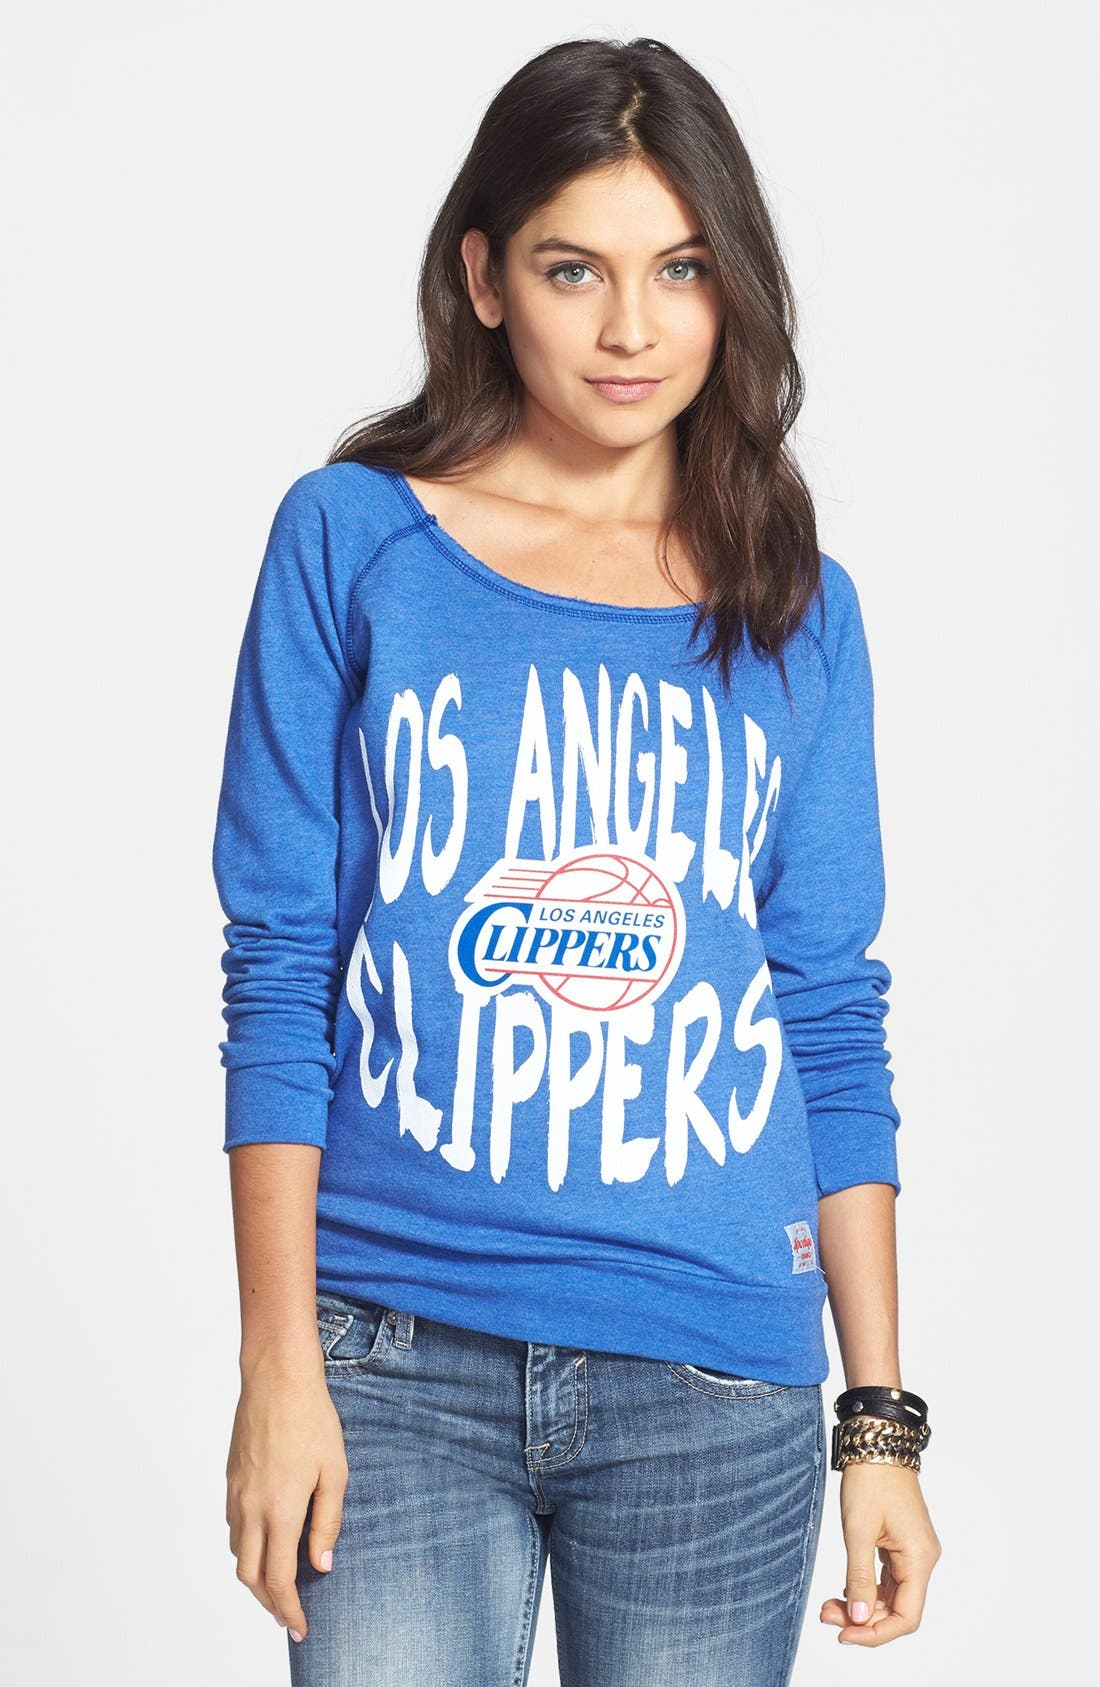 Alternate Image 1 Selected - Sportiqe 'Los Angeles Clippers' Wide Neck Fleece Sweatshirt (Juniors) (Online Only)